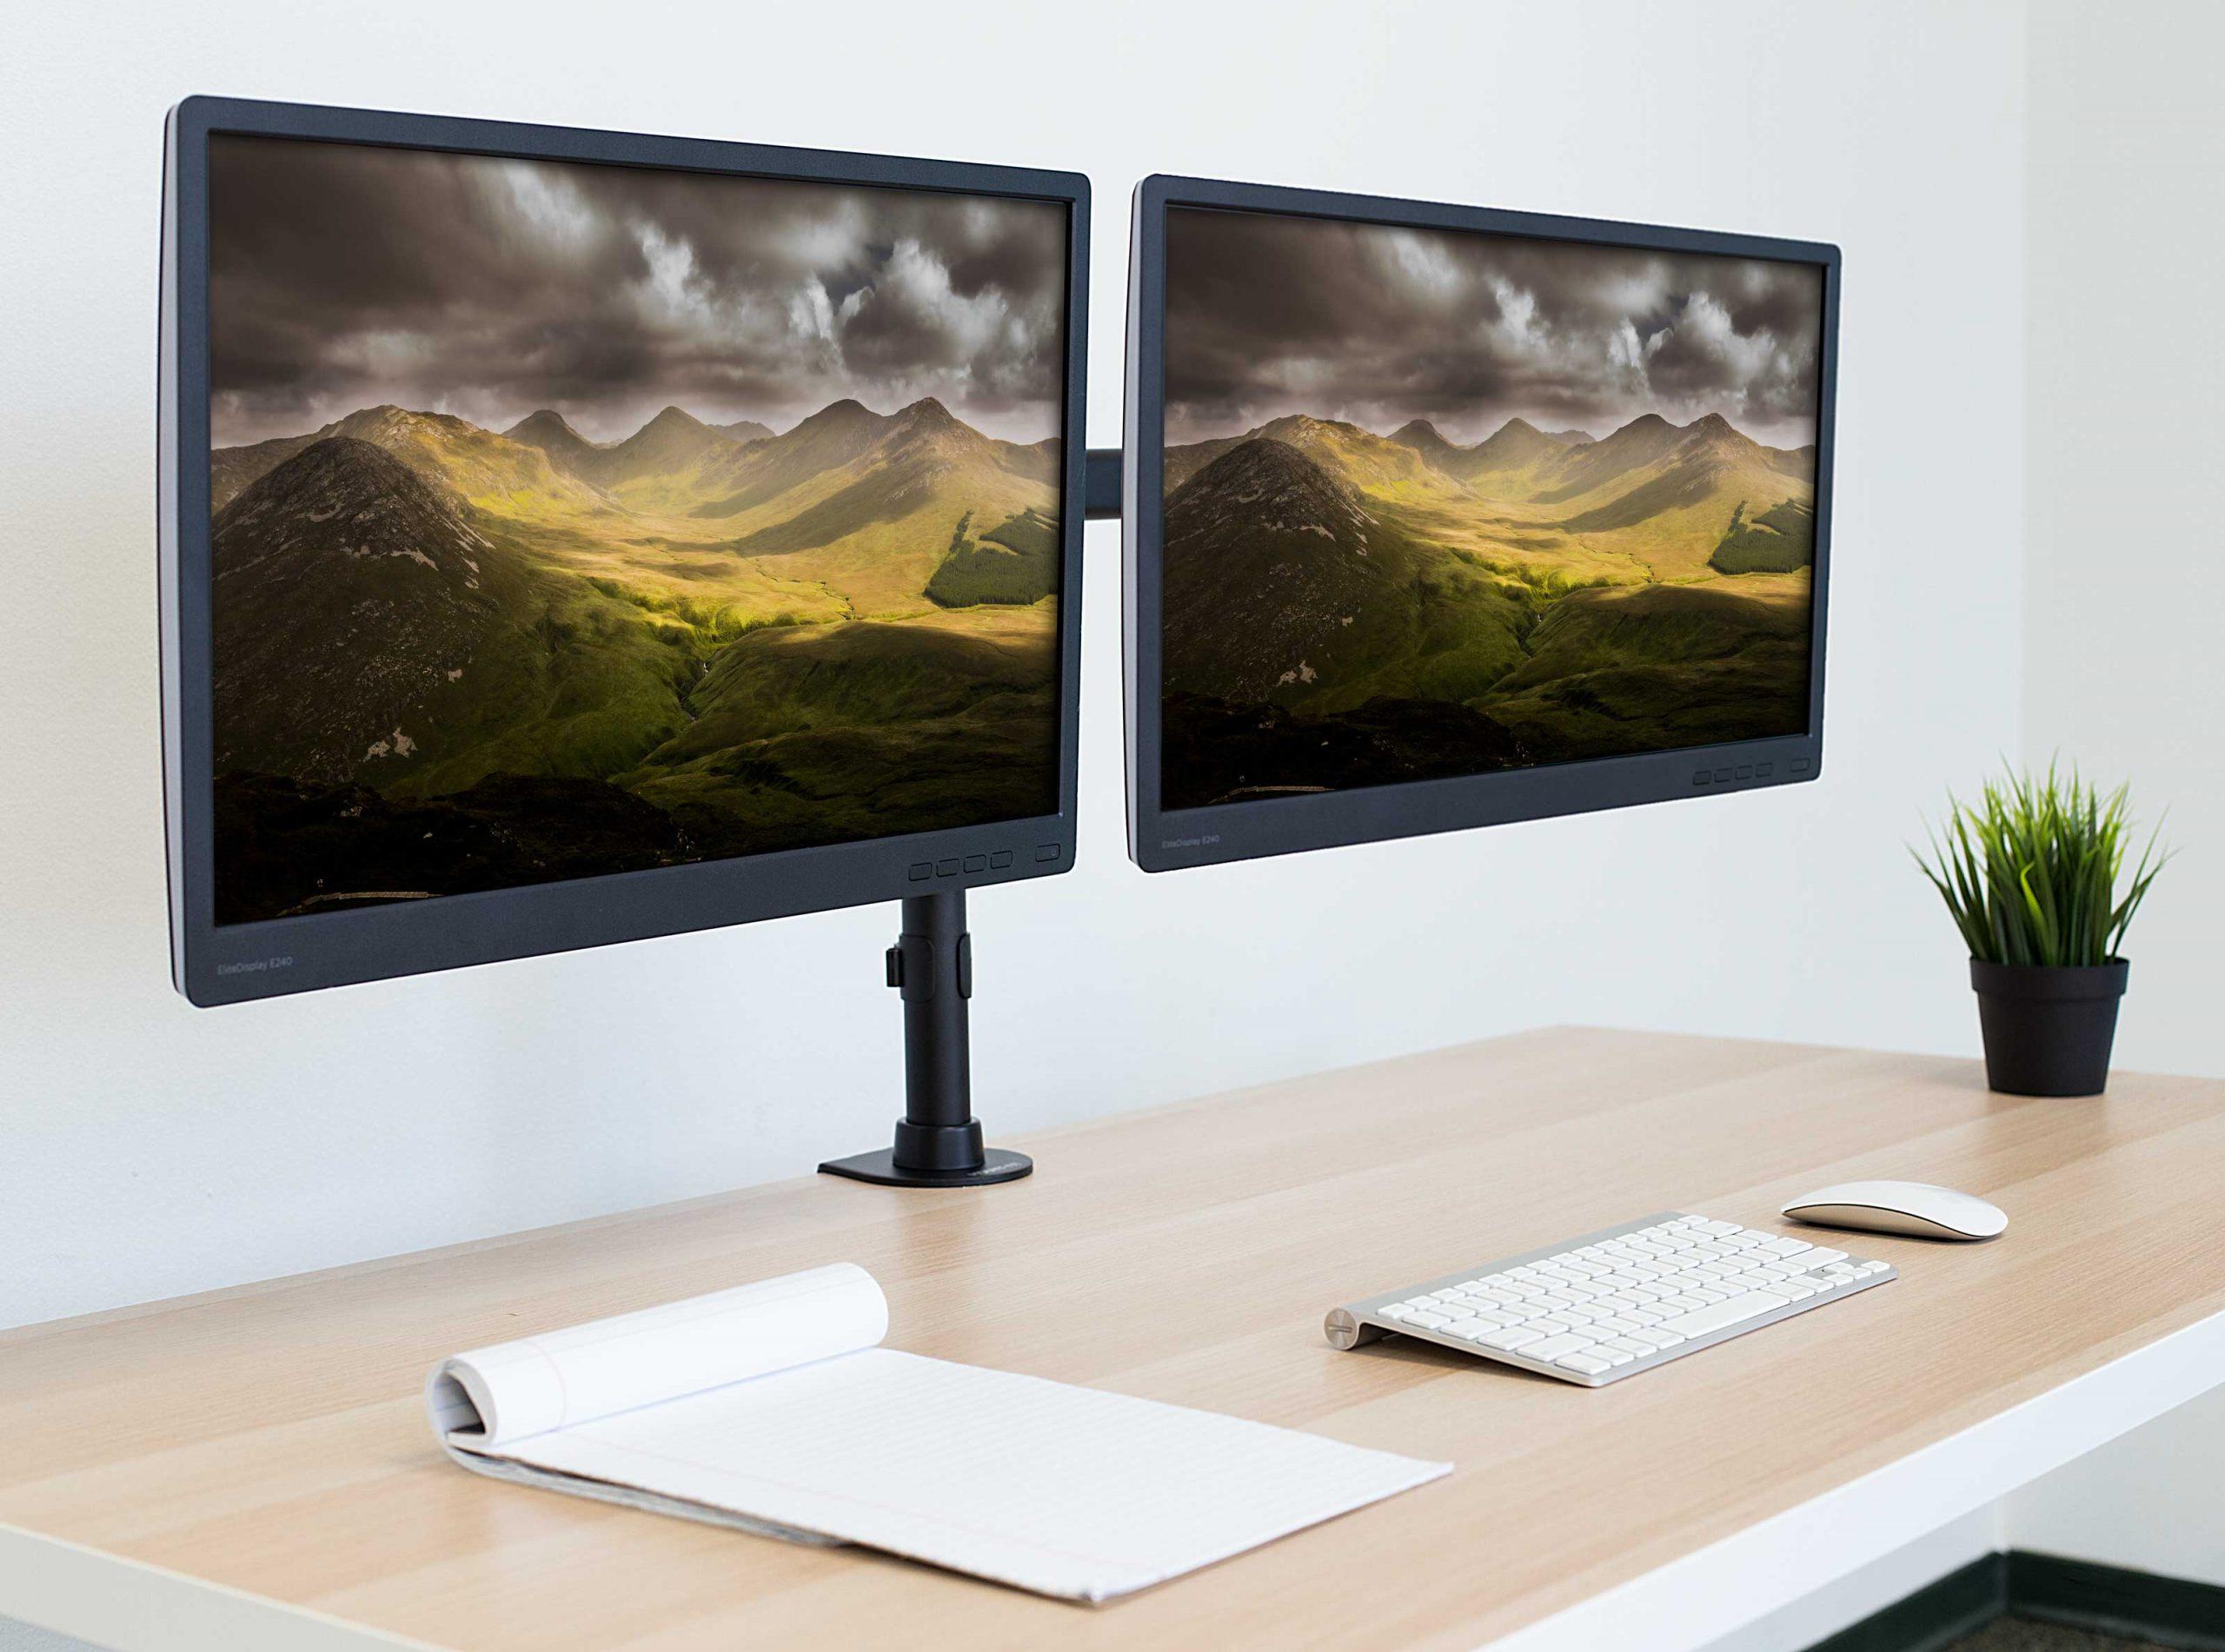 monitors for gaming